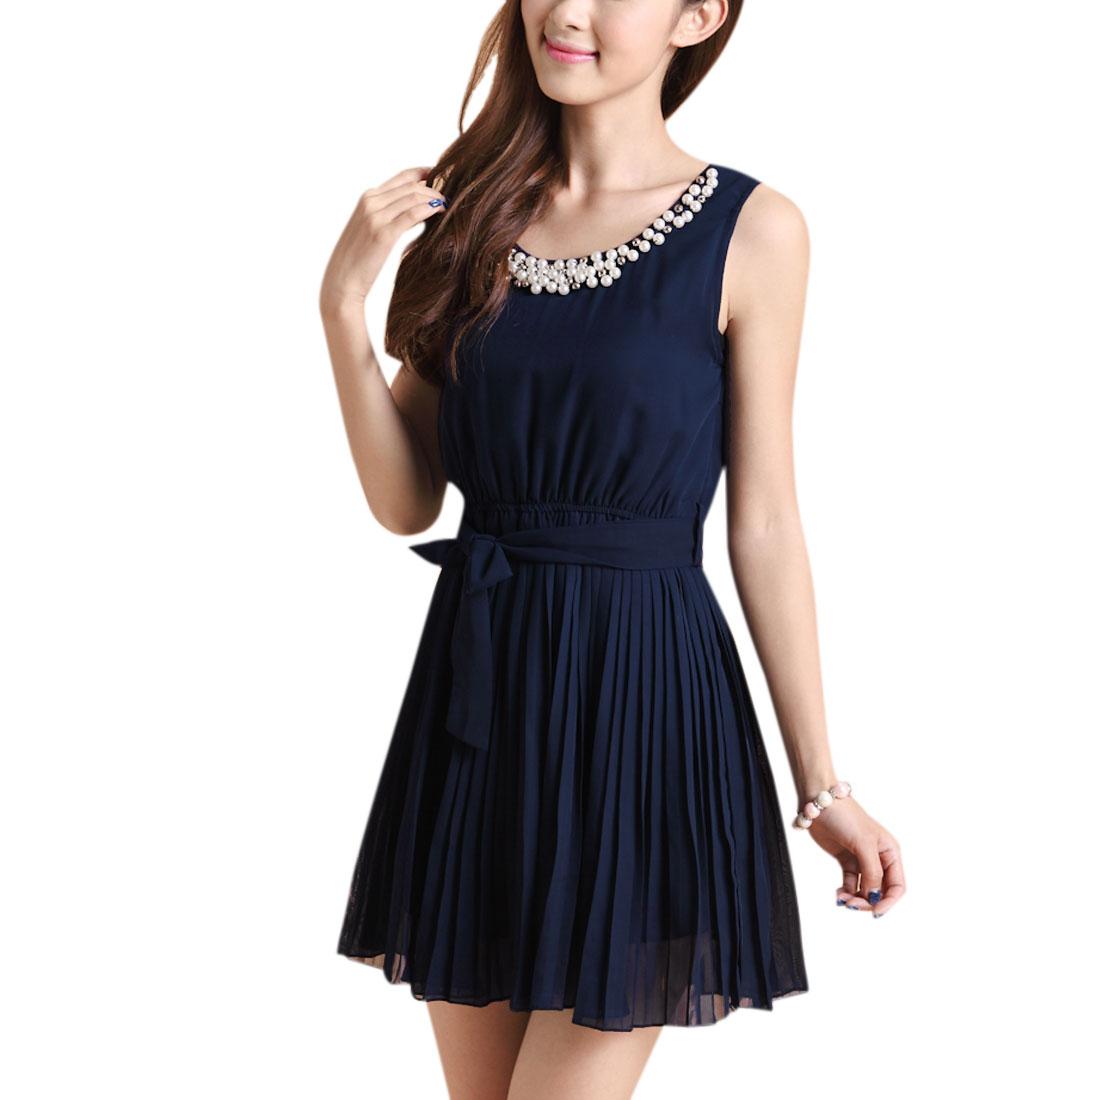 Lady Pullover Leisure Fake Pearls Decor Neckline Chiffon Dark Blue Dress XS